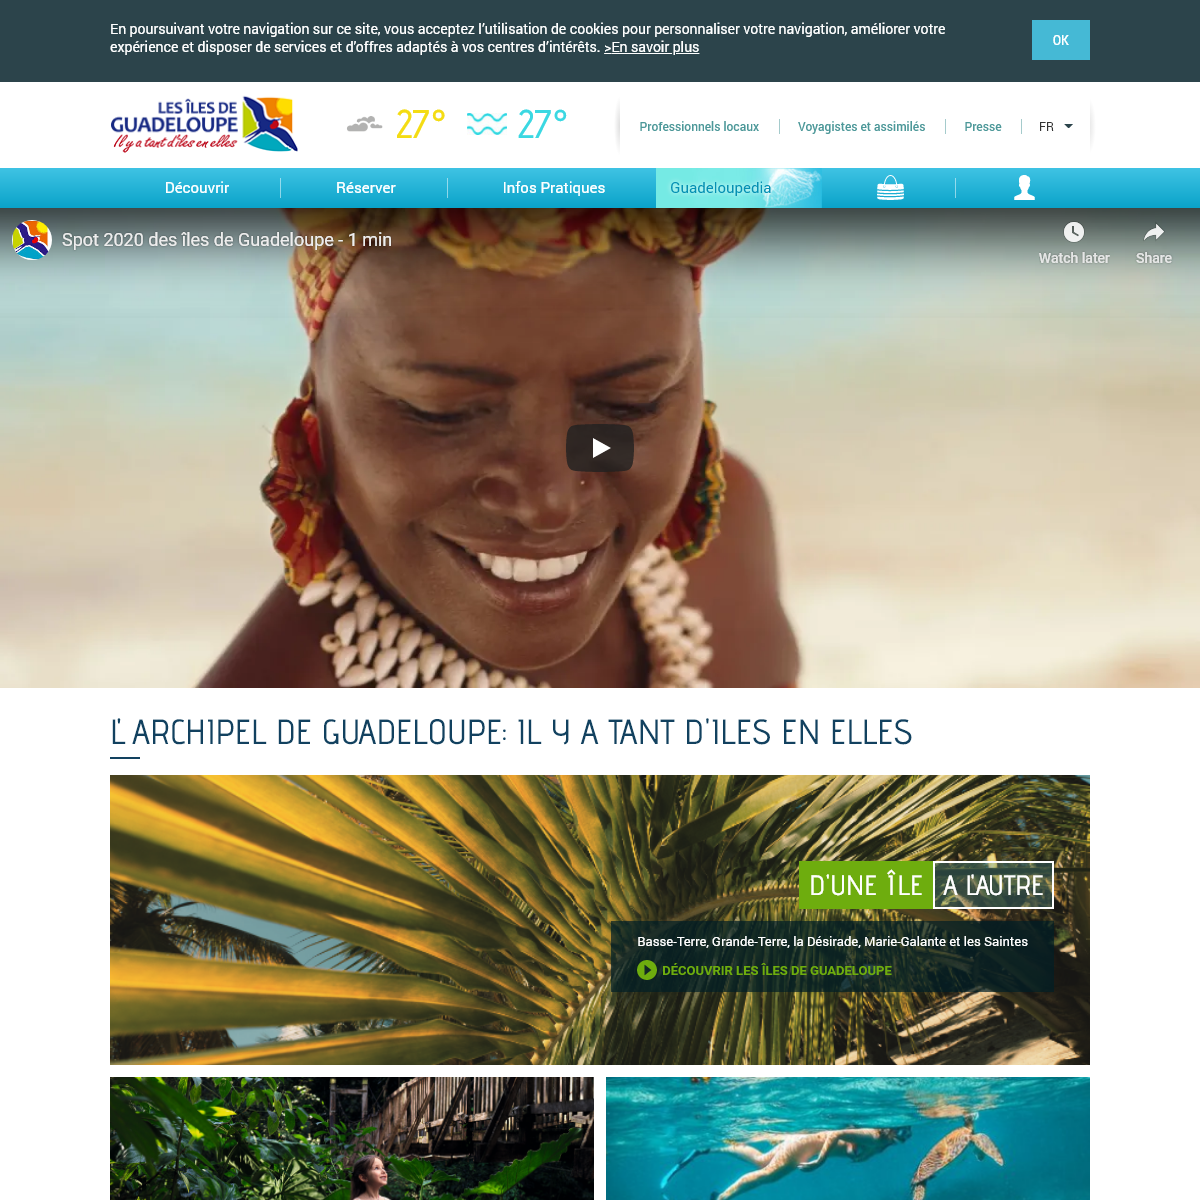 Les îles de Guadeloupe - Les îles de Guadeloupe